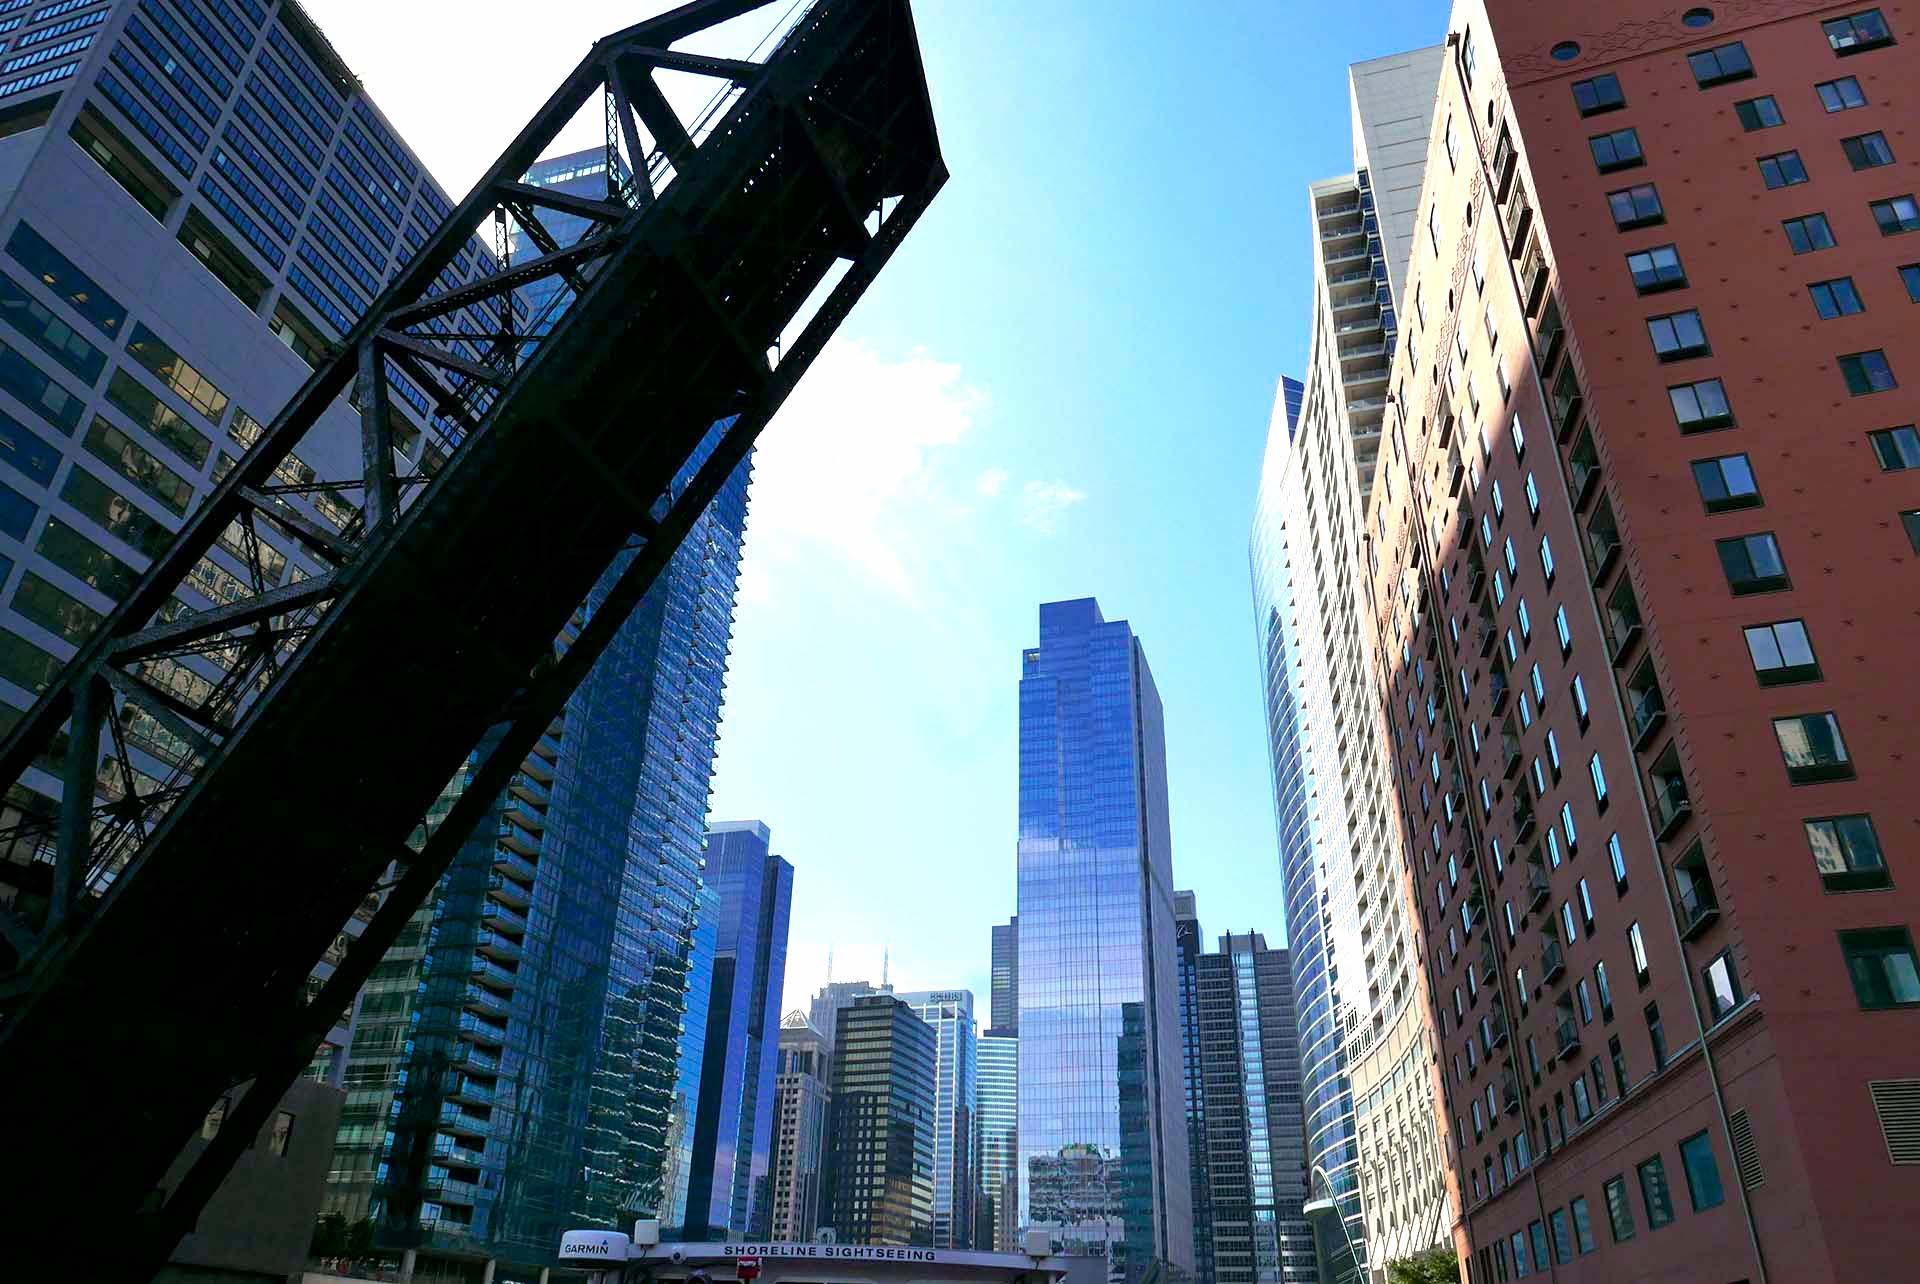 Chicago Shorelinesightseeing Arquitecture